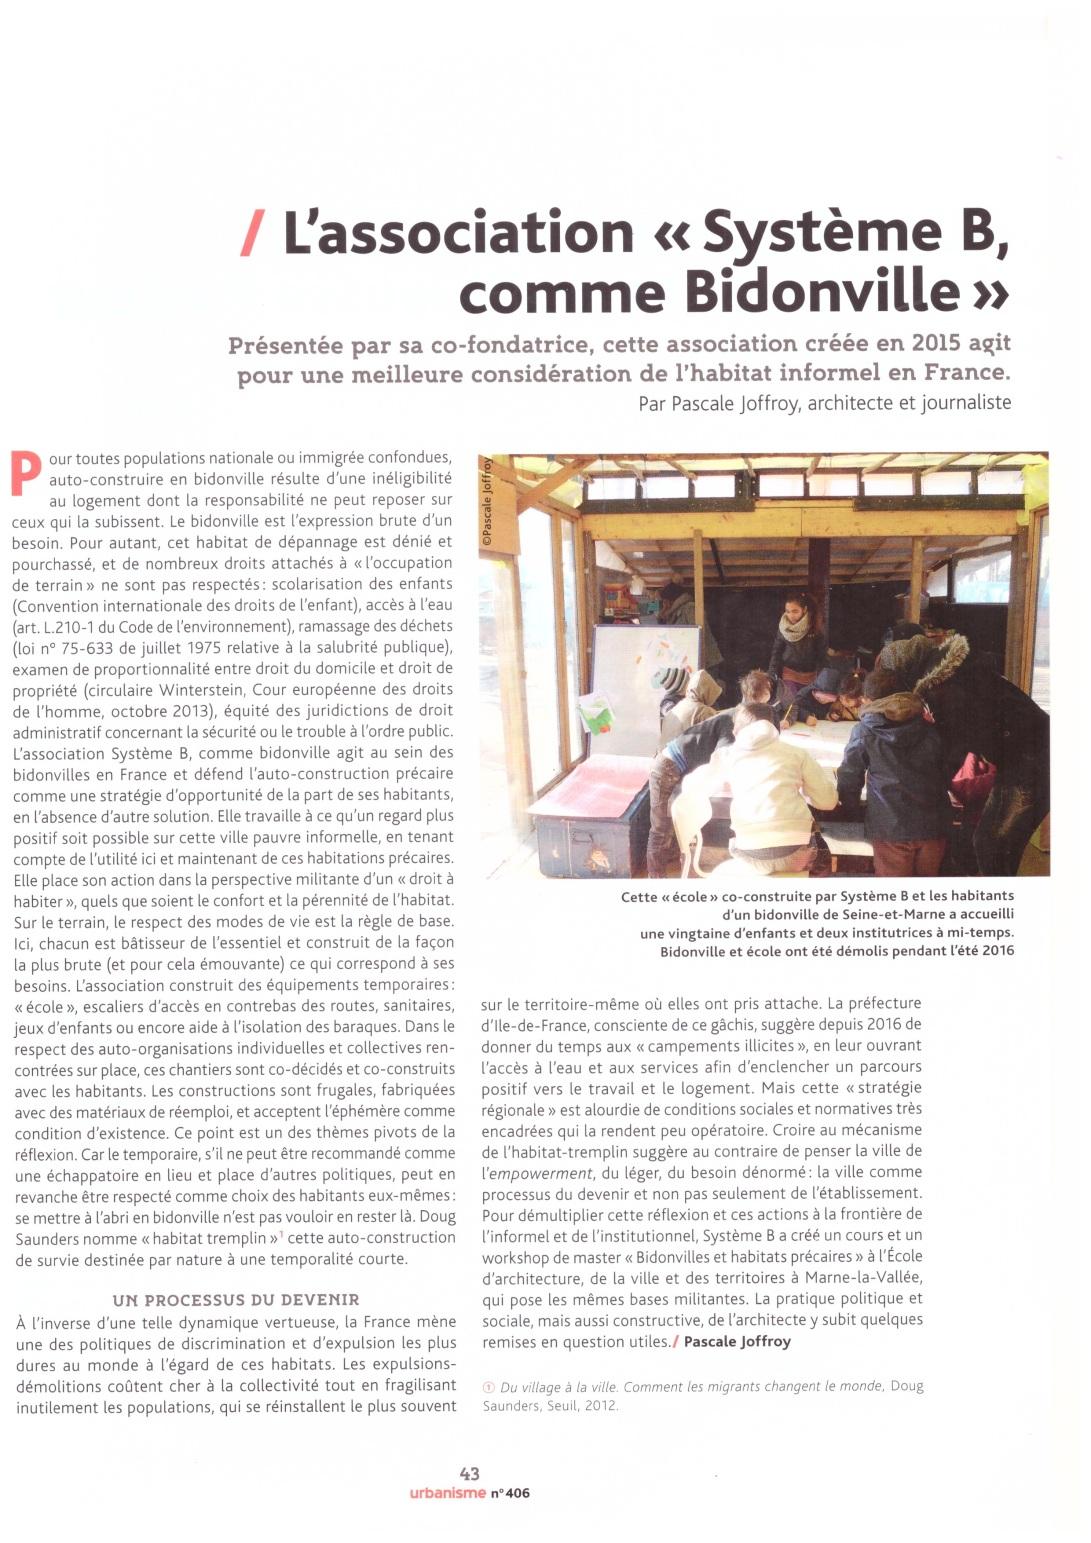 article SystèmeB - Urbanisme n°406